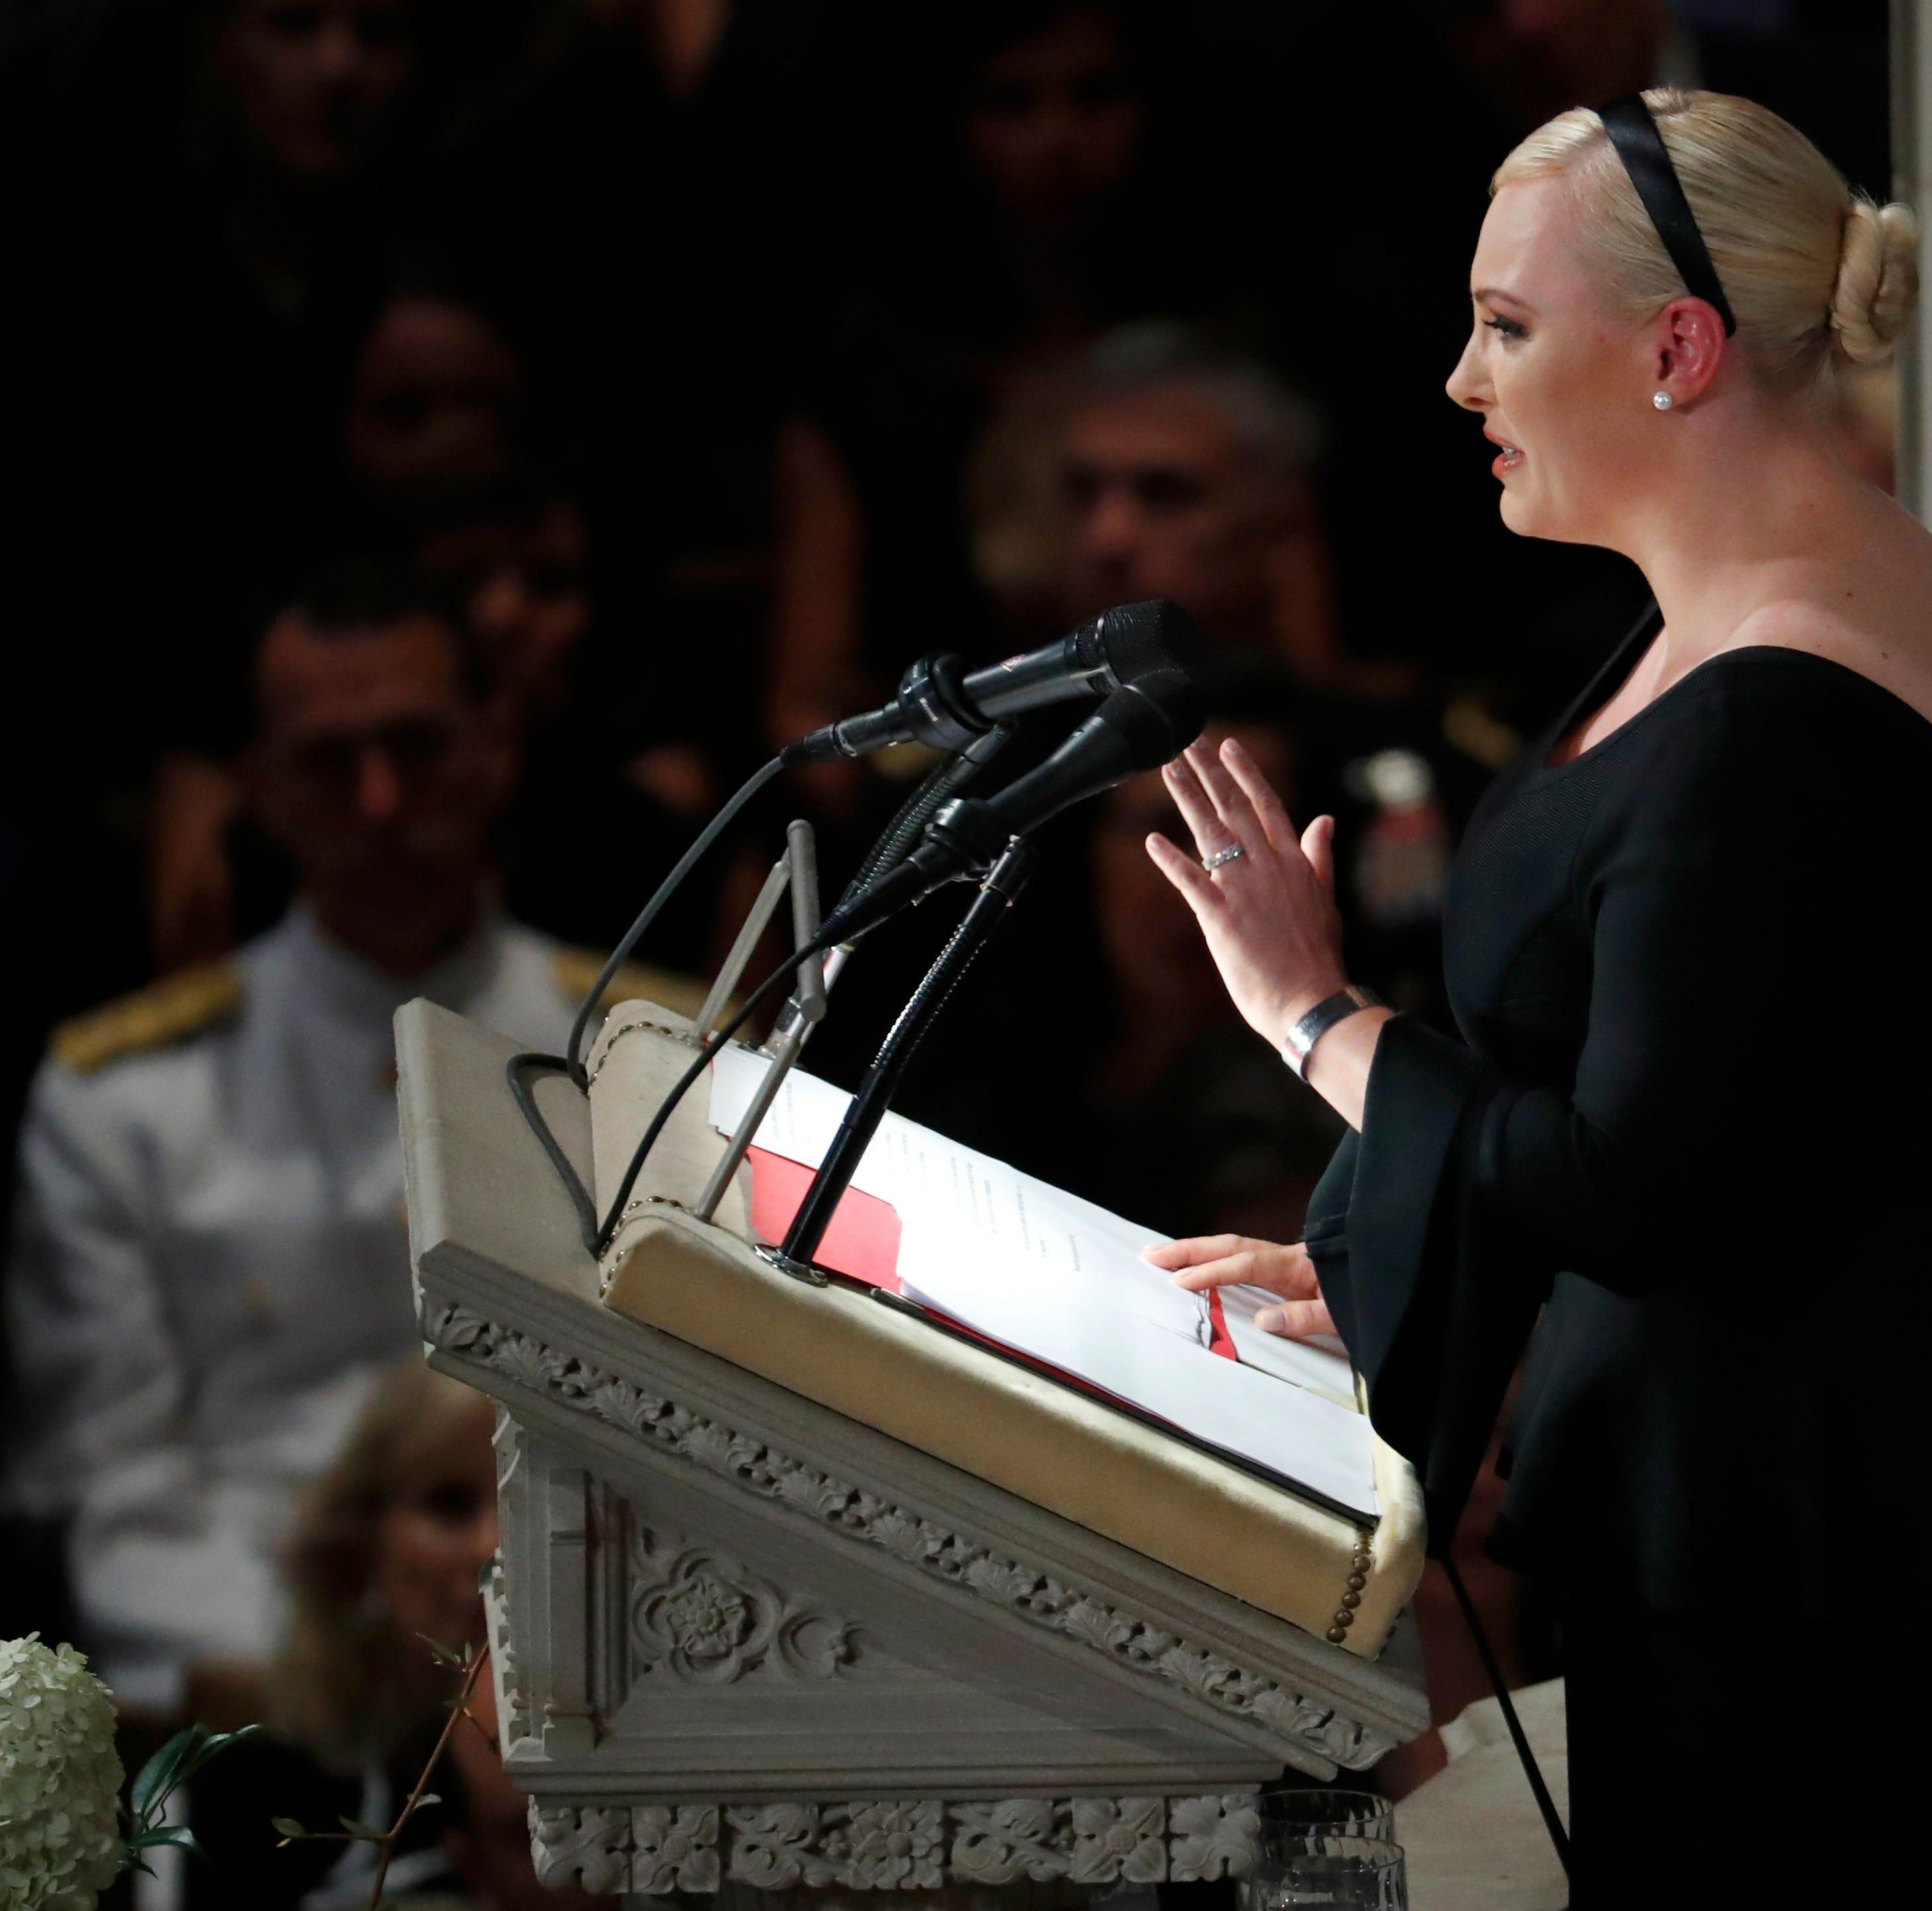 Dead deserve eulogization without politicization | Opinion